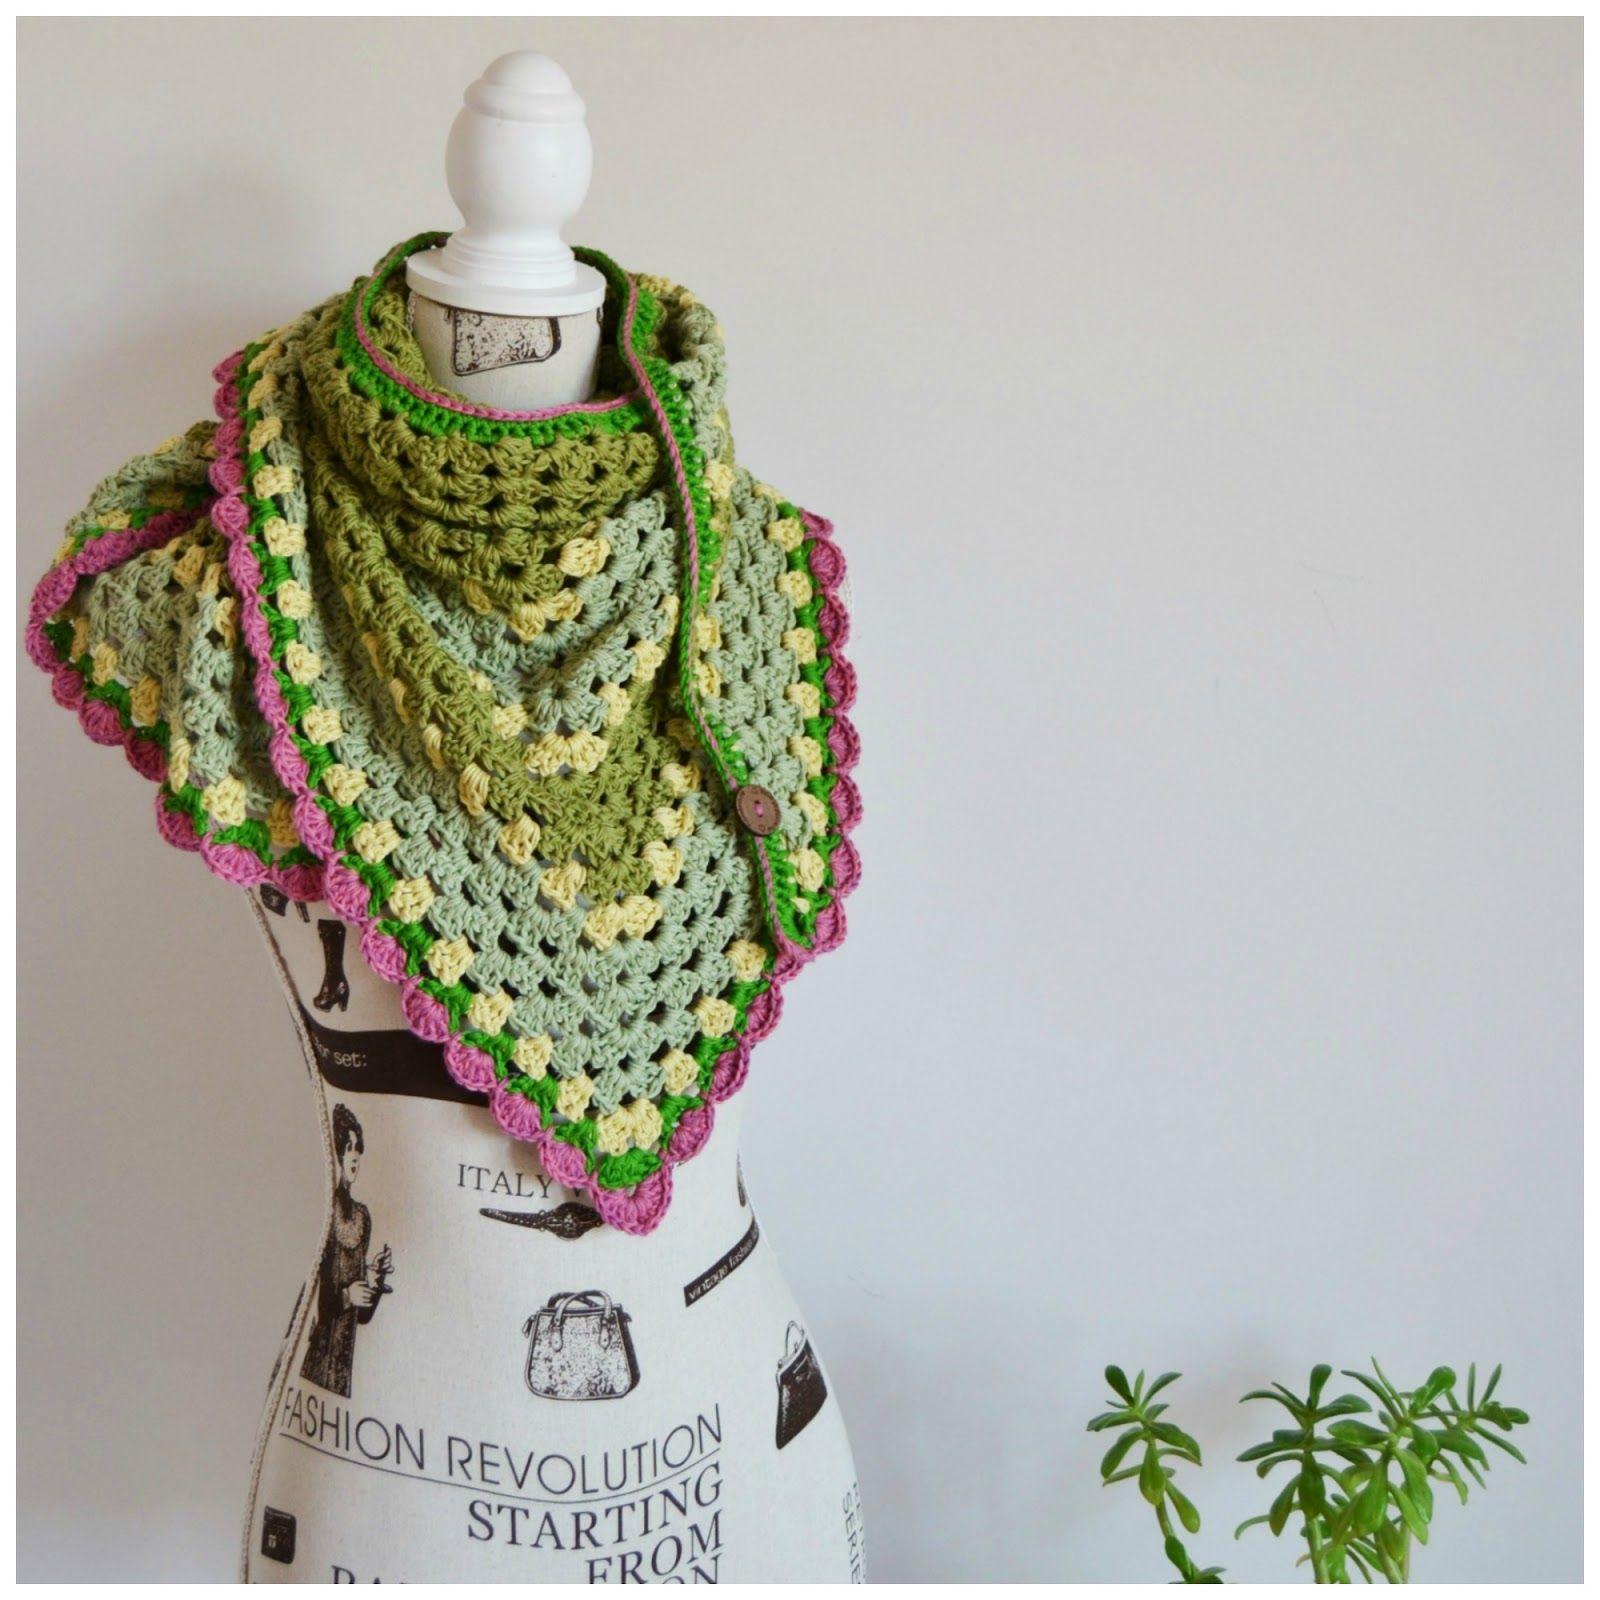 my world of wool: crochet shawl and Anni B Sweet - Chasing Illusions ...